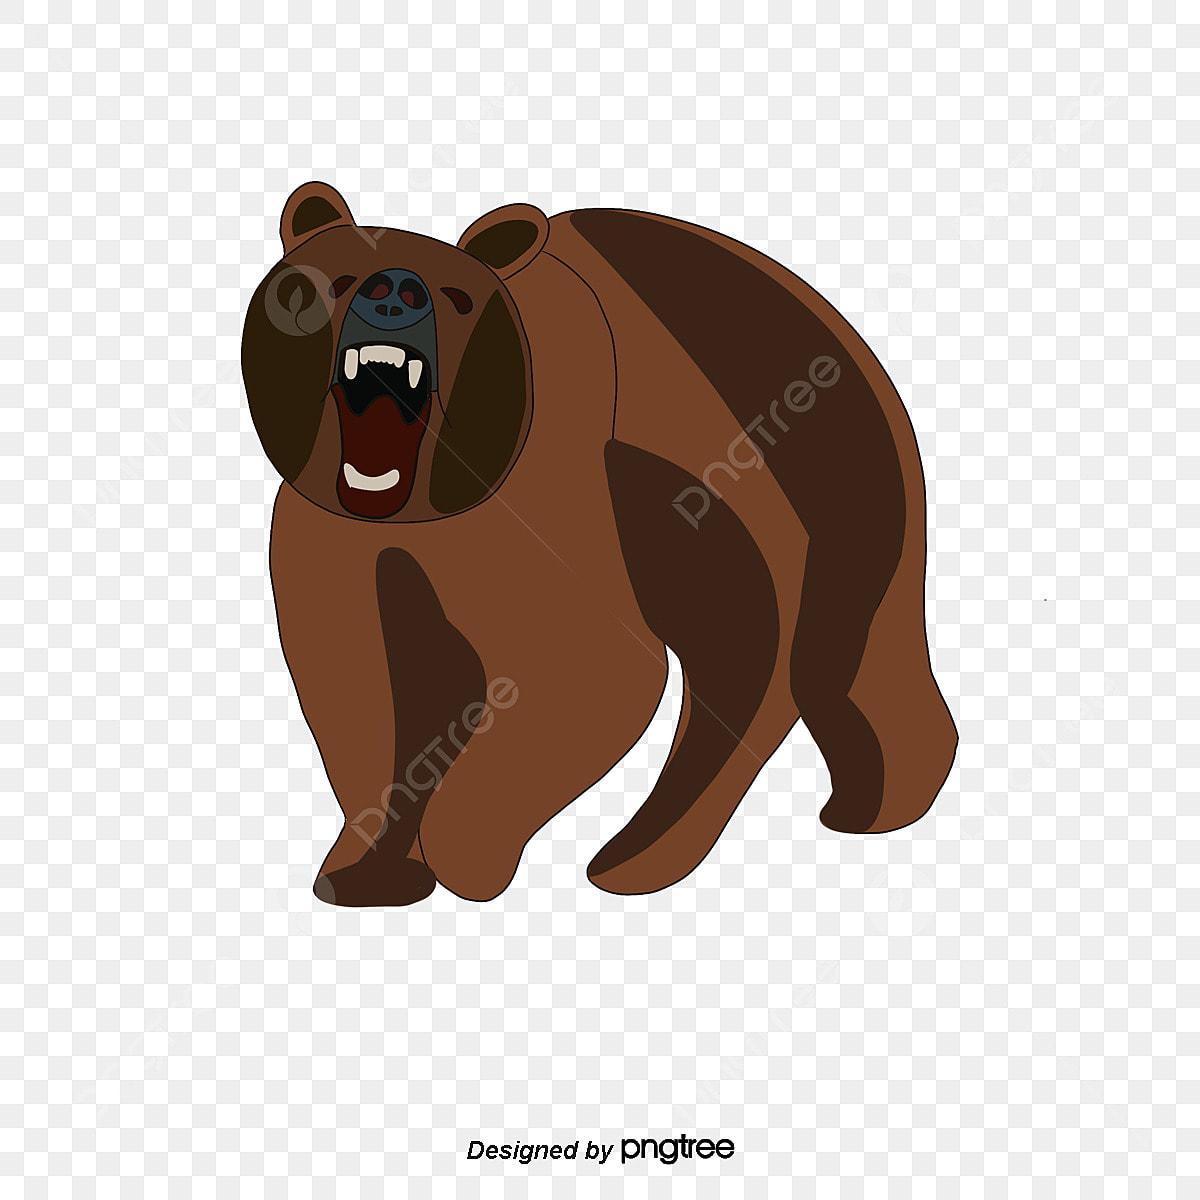 Coklat Kartun Lukisan Tangan Beruang Besar Unsur Unsur